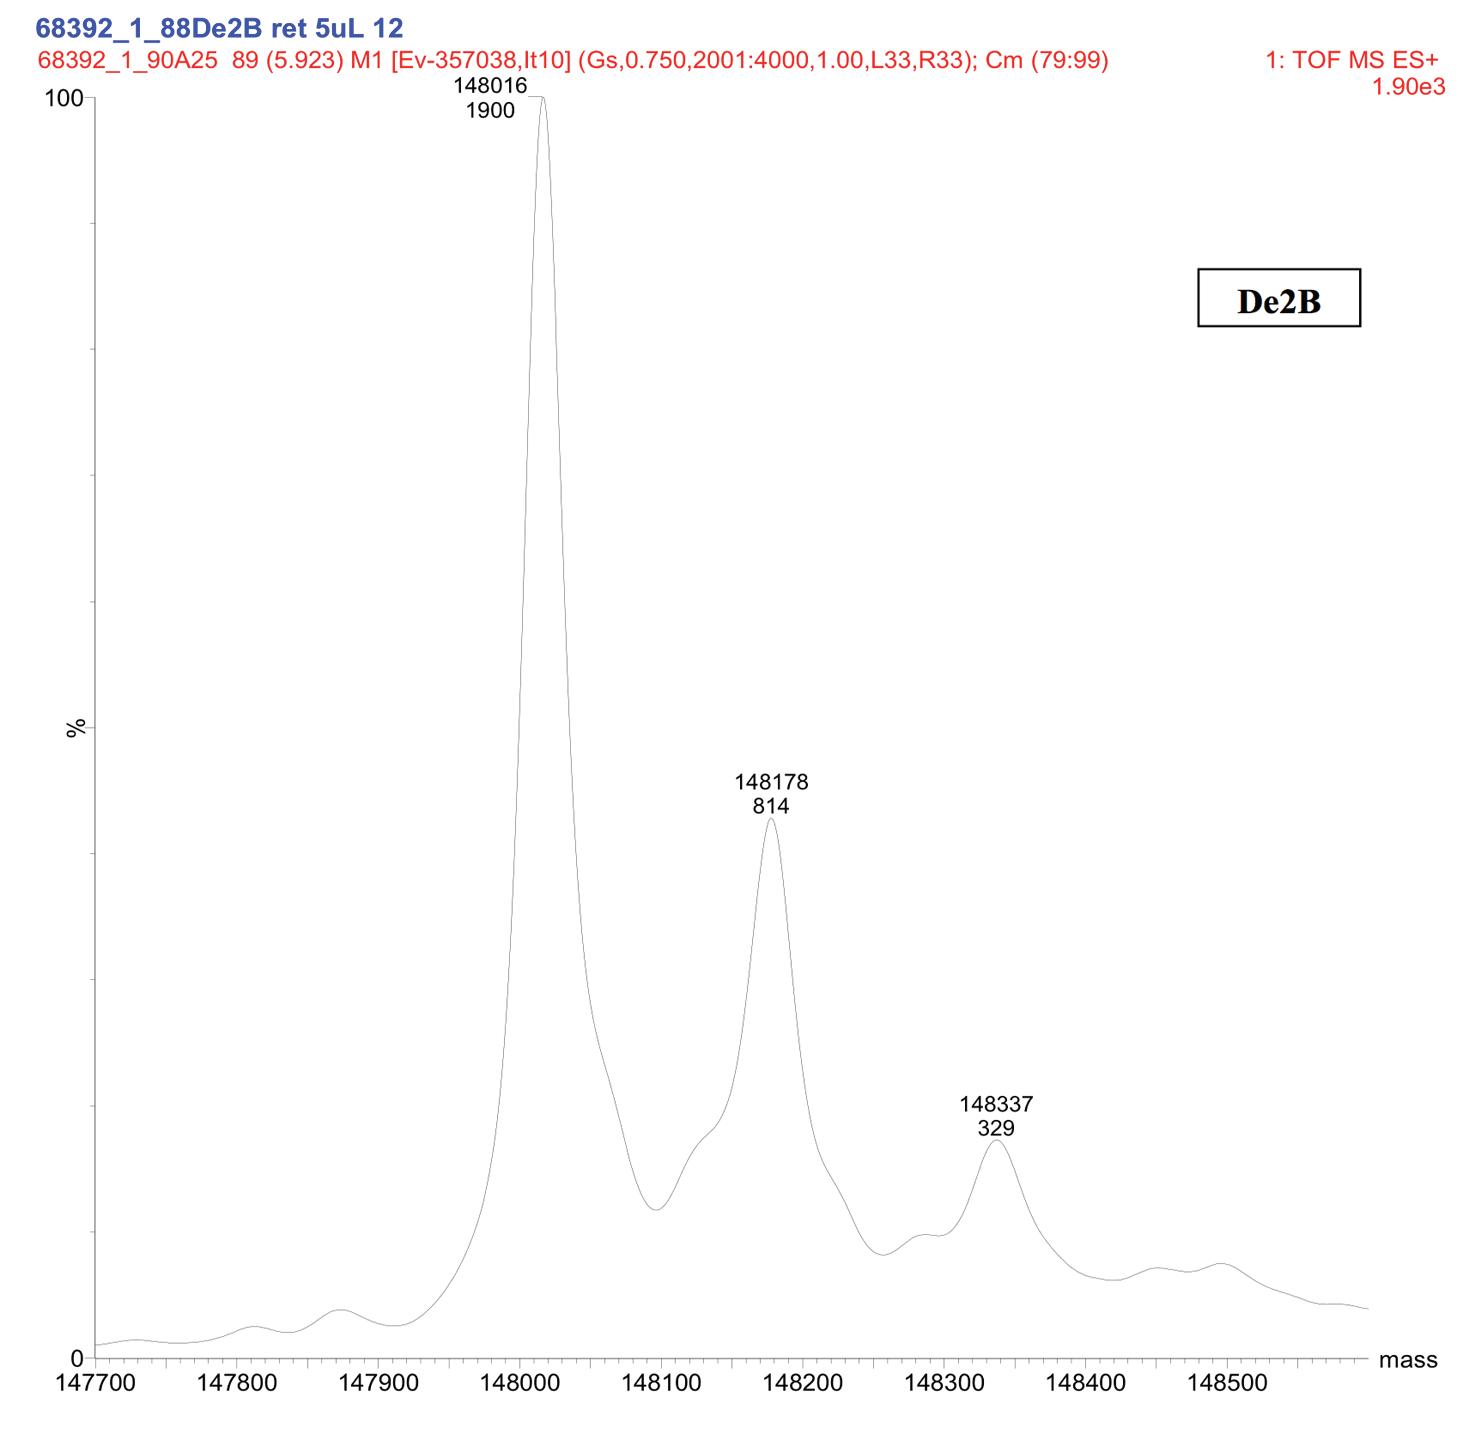 Figure 9. Representative Deconvoluted Mass Spectra of Deamidated Sample (De2B)